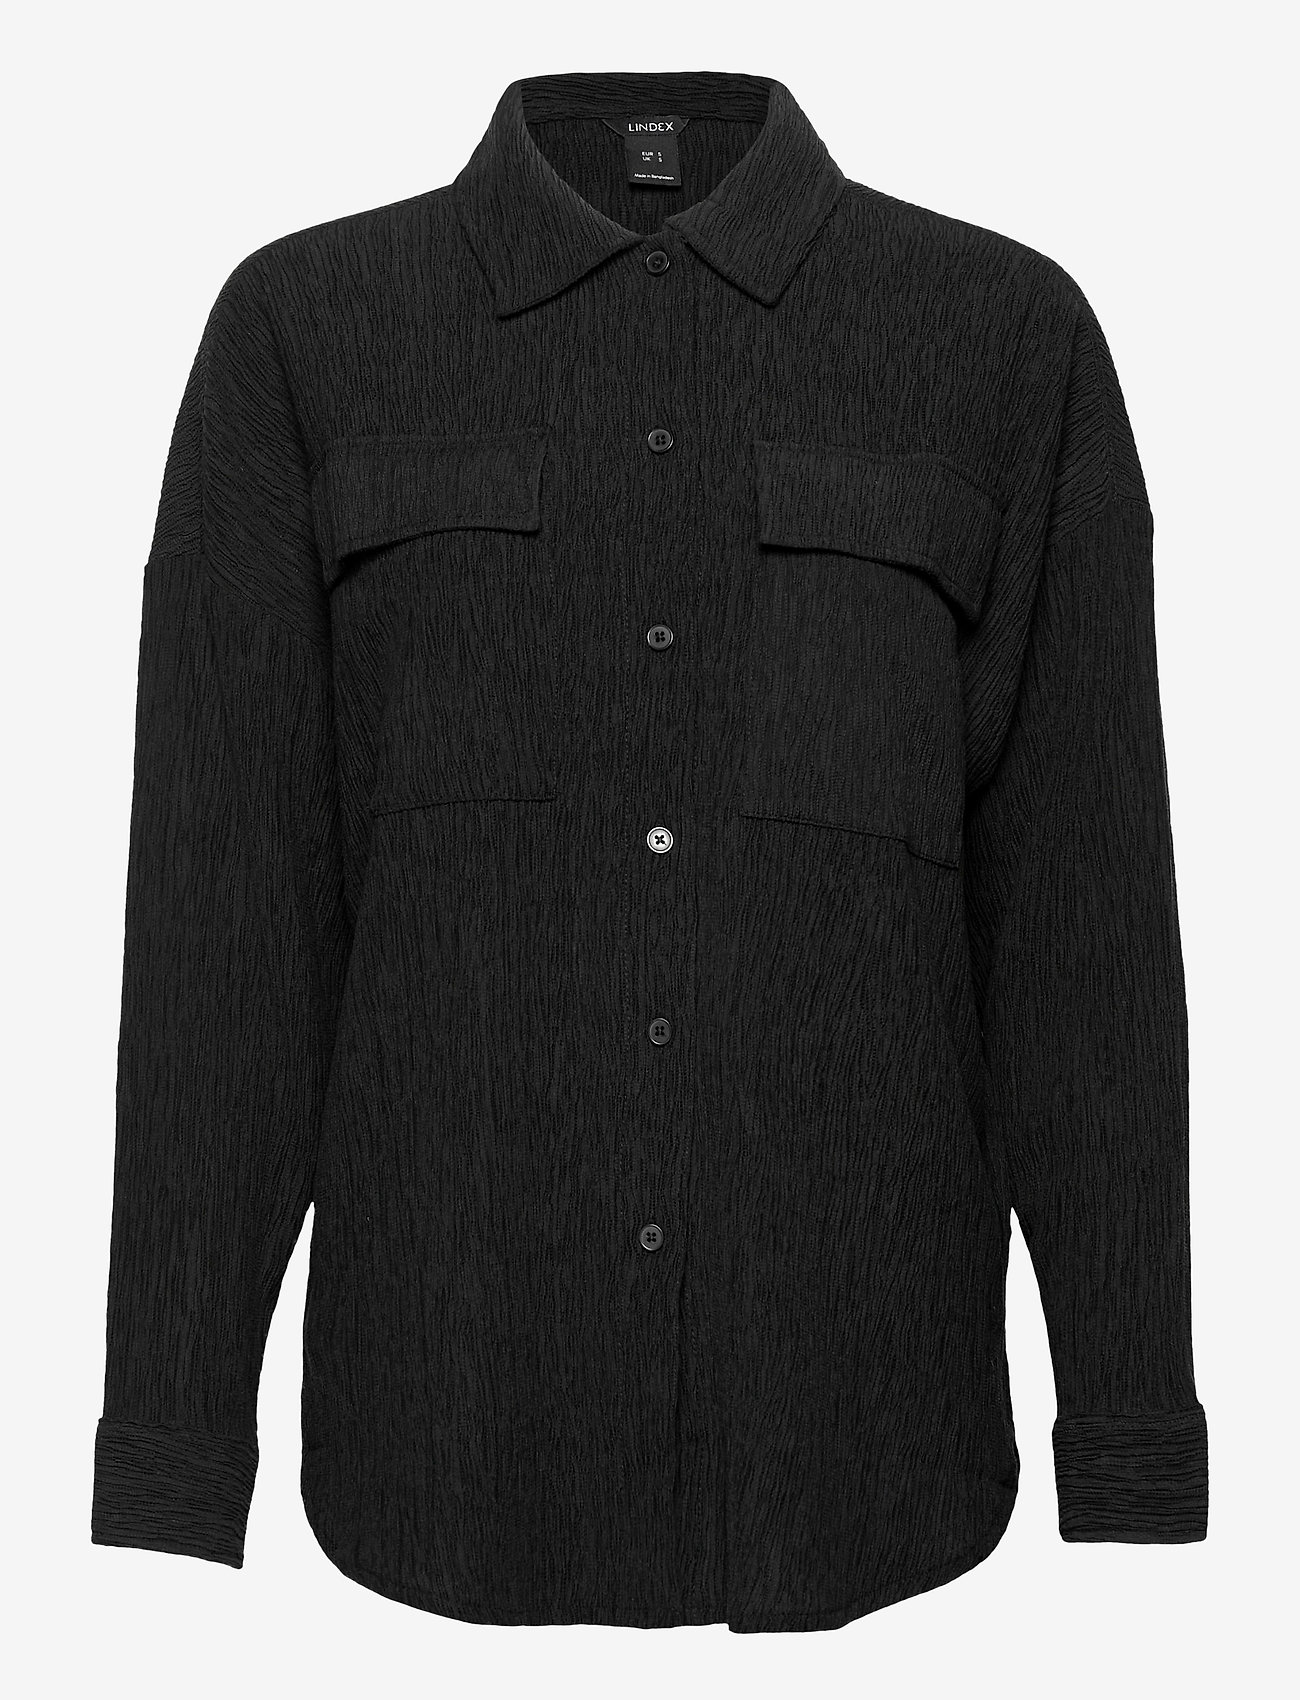 Lindex - Corinne Shacket Plisse - kleding - black - 0